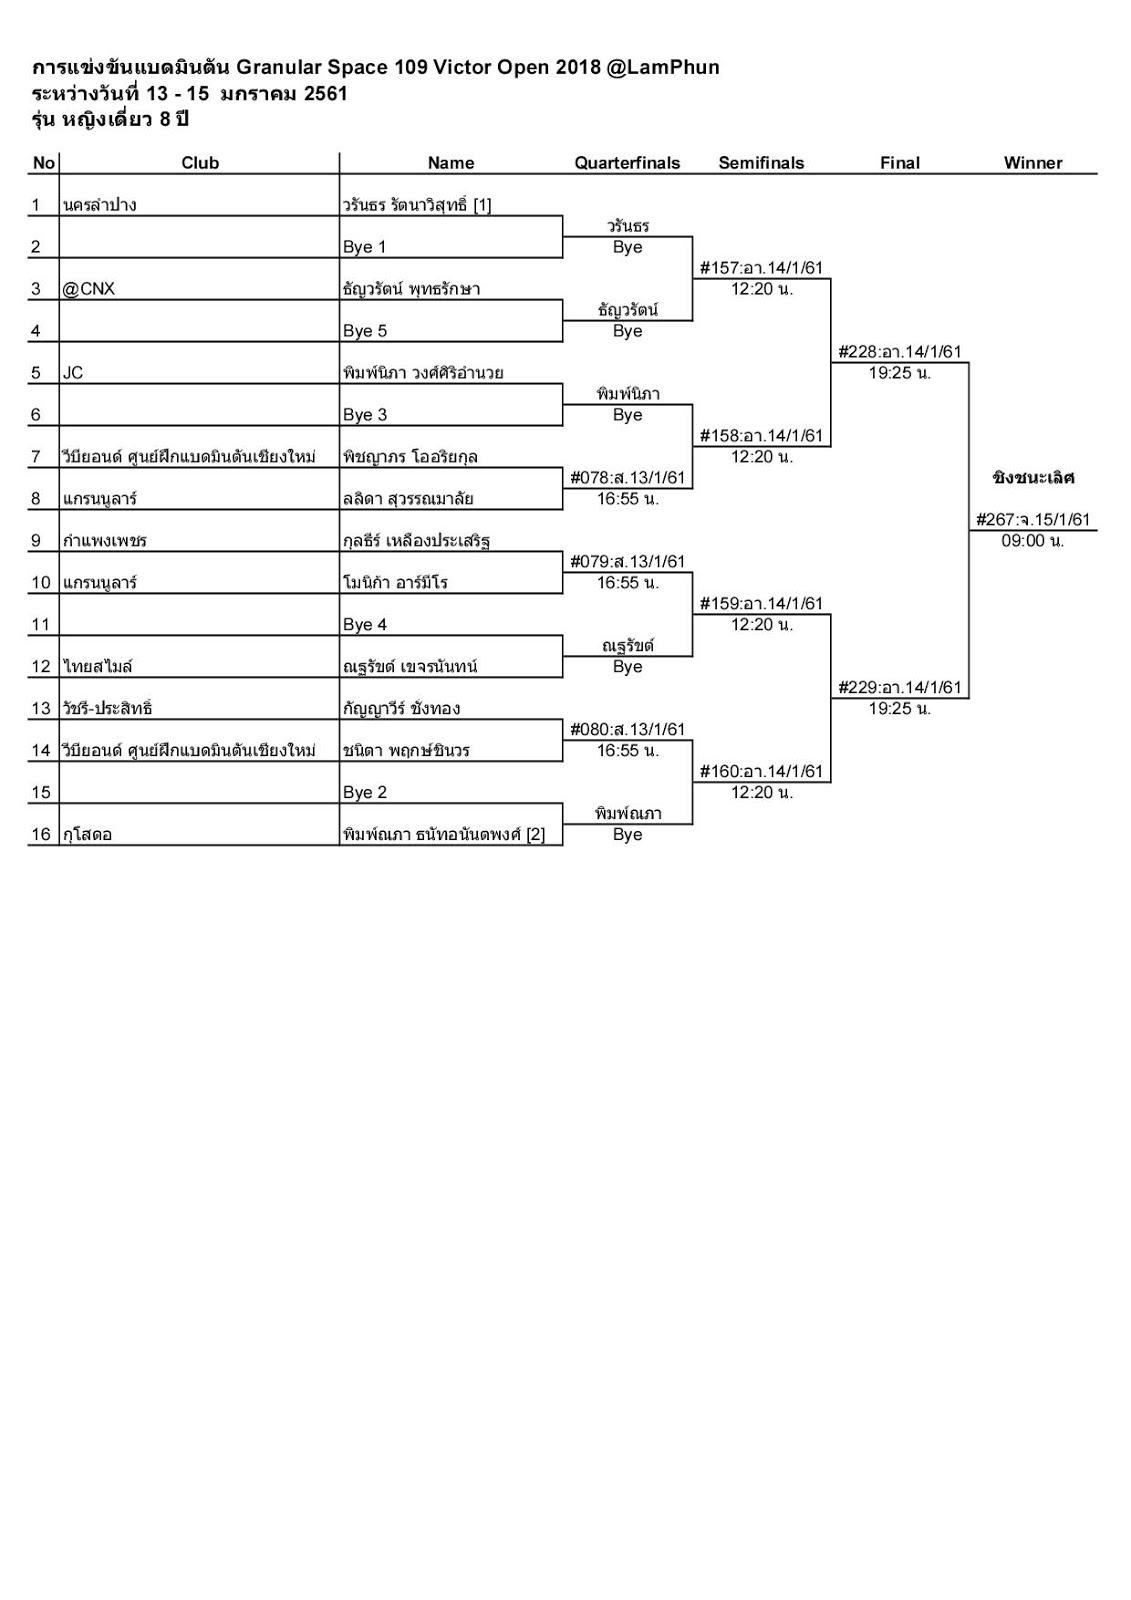 victor badminton 2016 filetype pdf